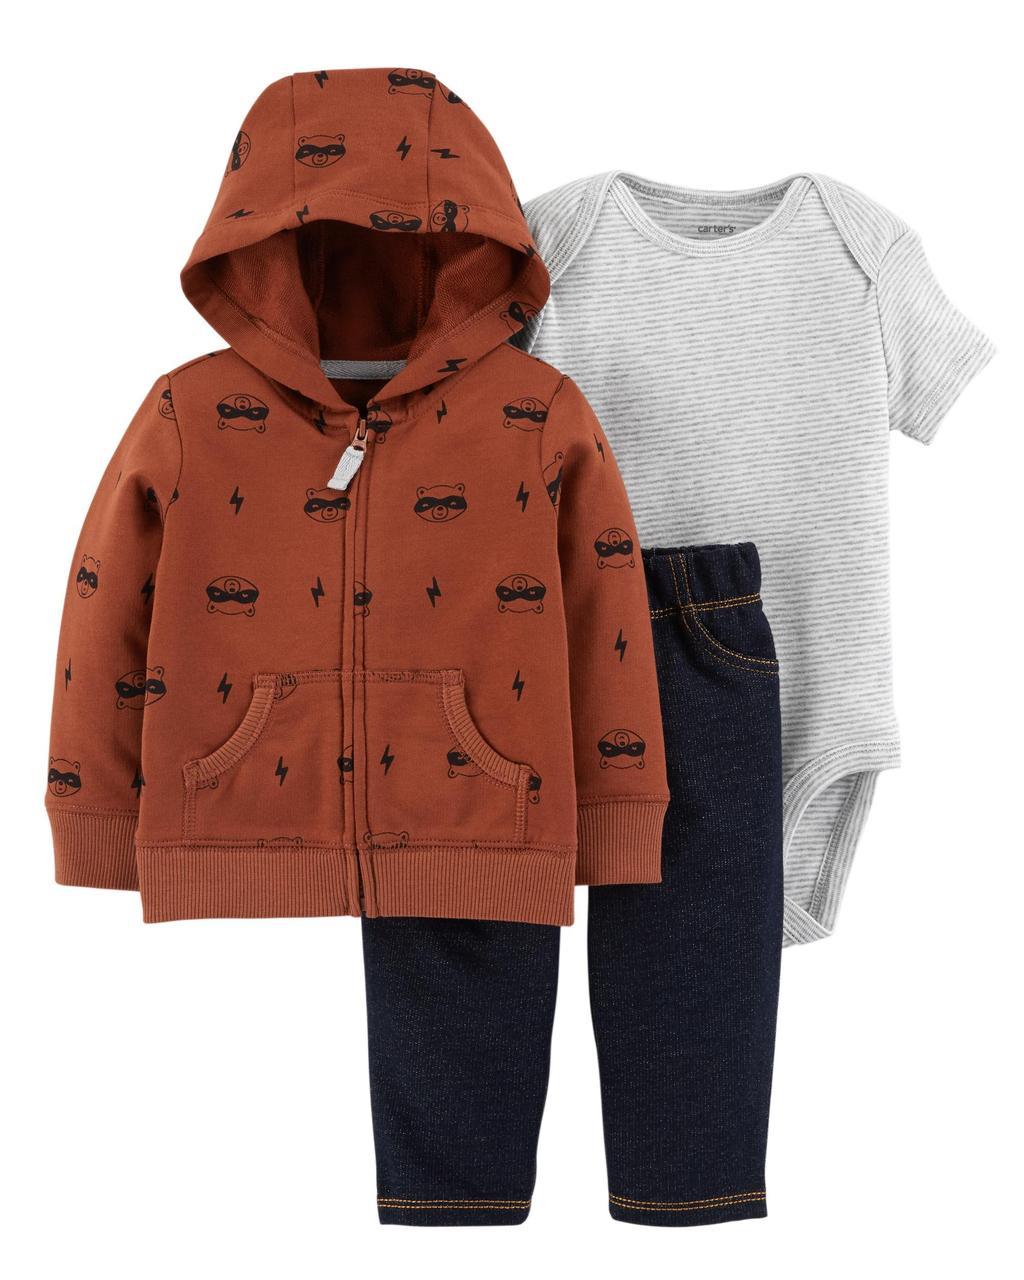 Комплект для хлопчика carter's (курточка, боді, штани), 6міс